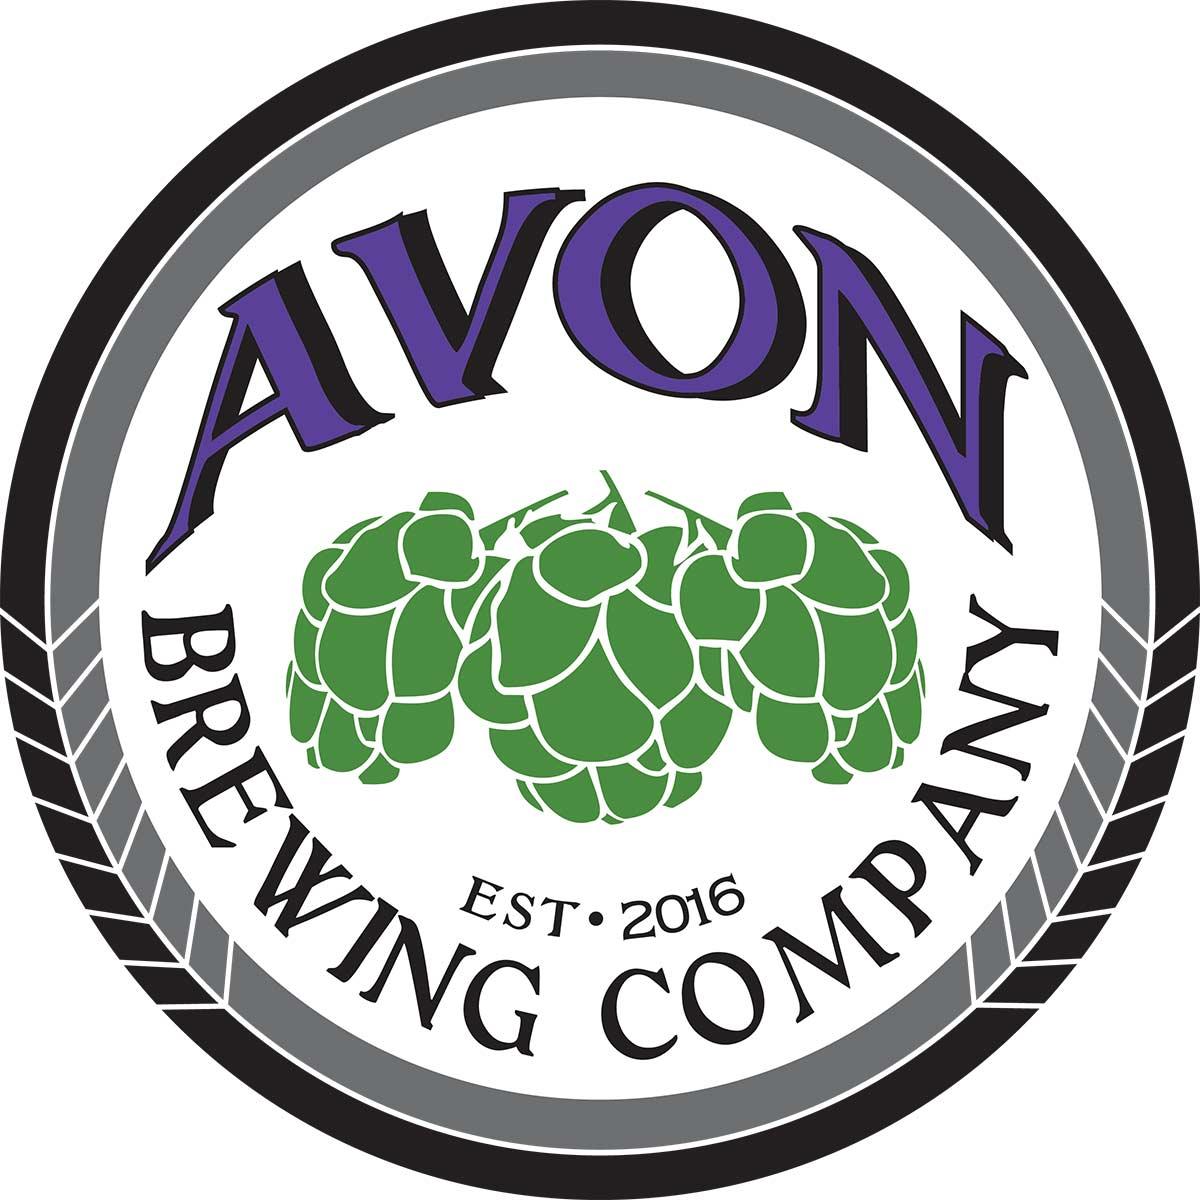 Avon Brewing Company